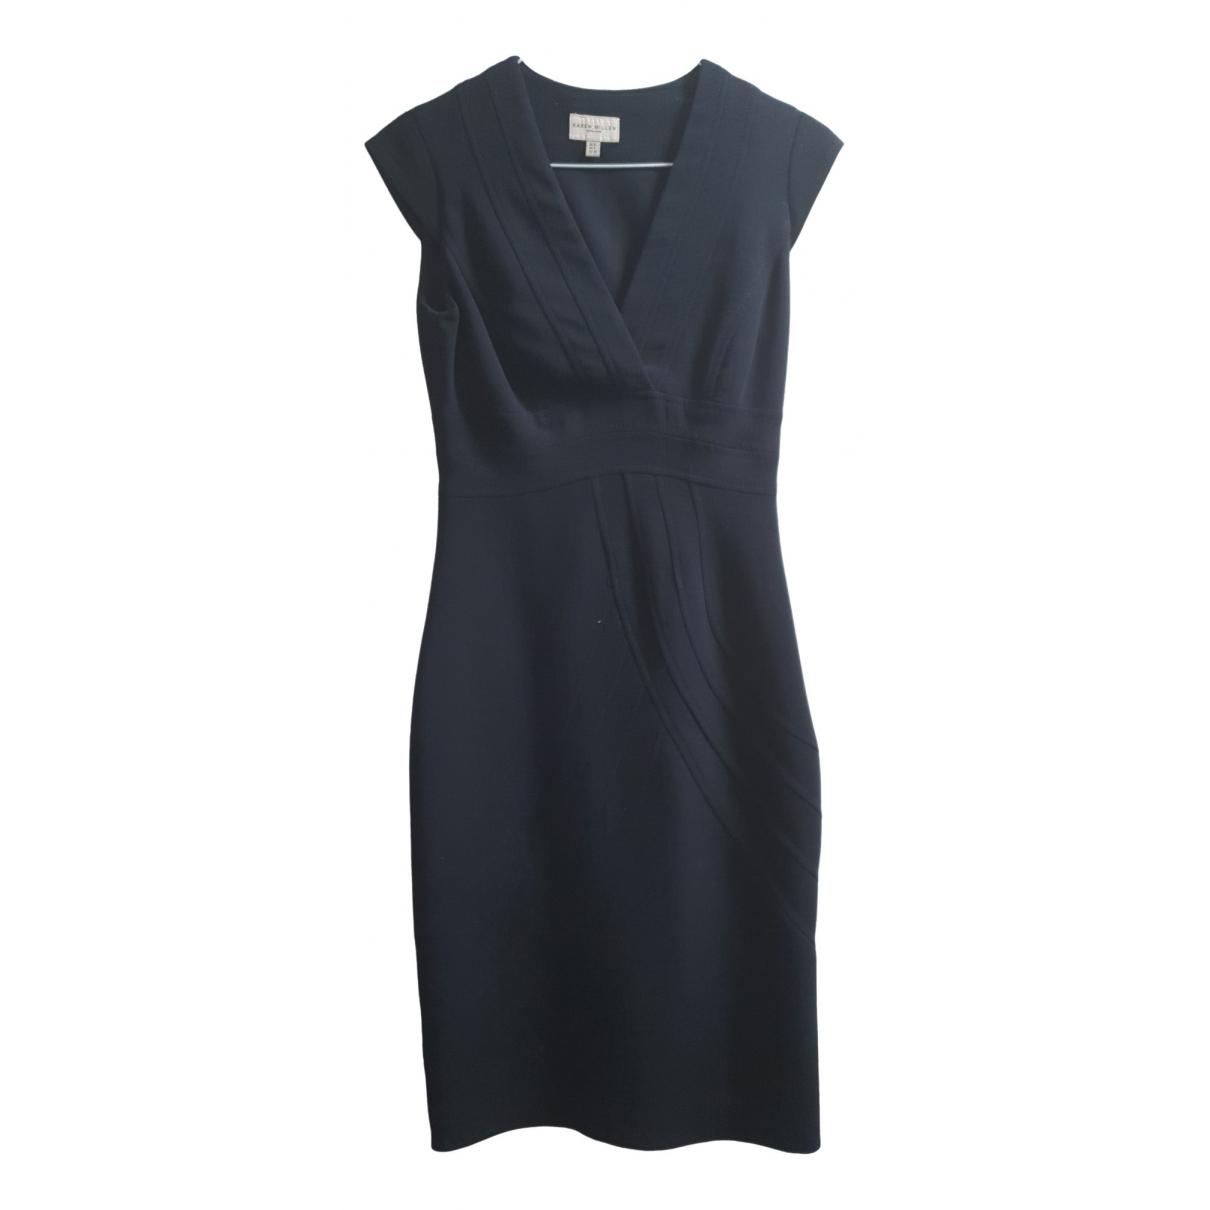 Karen Millen \N Black Wool dress for Women 8 UK